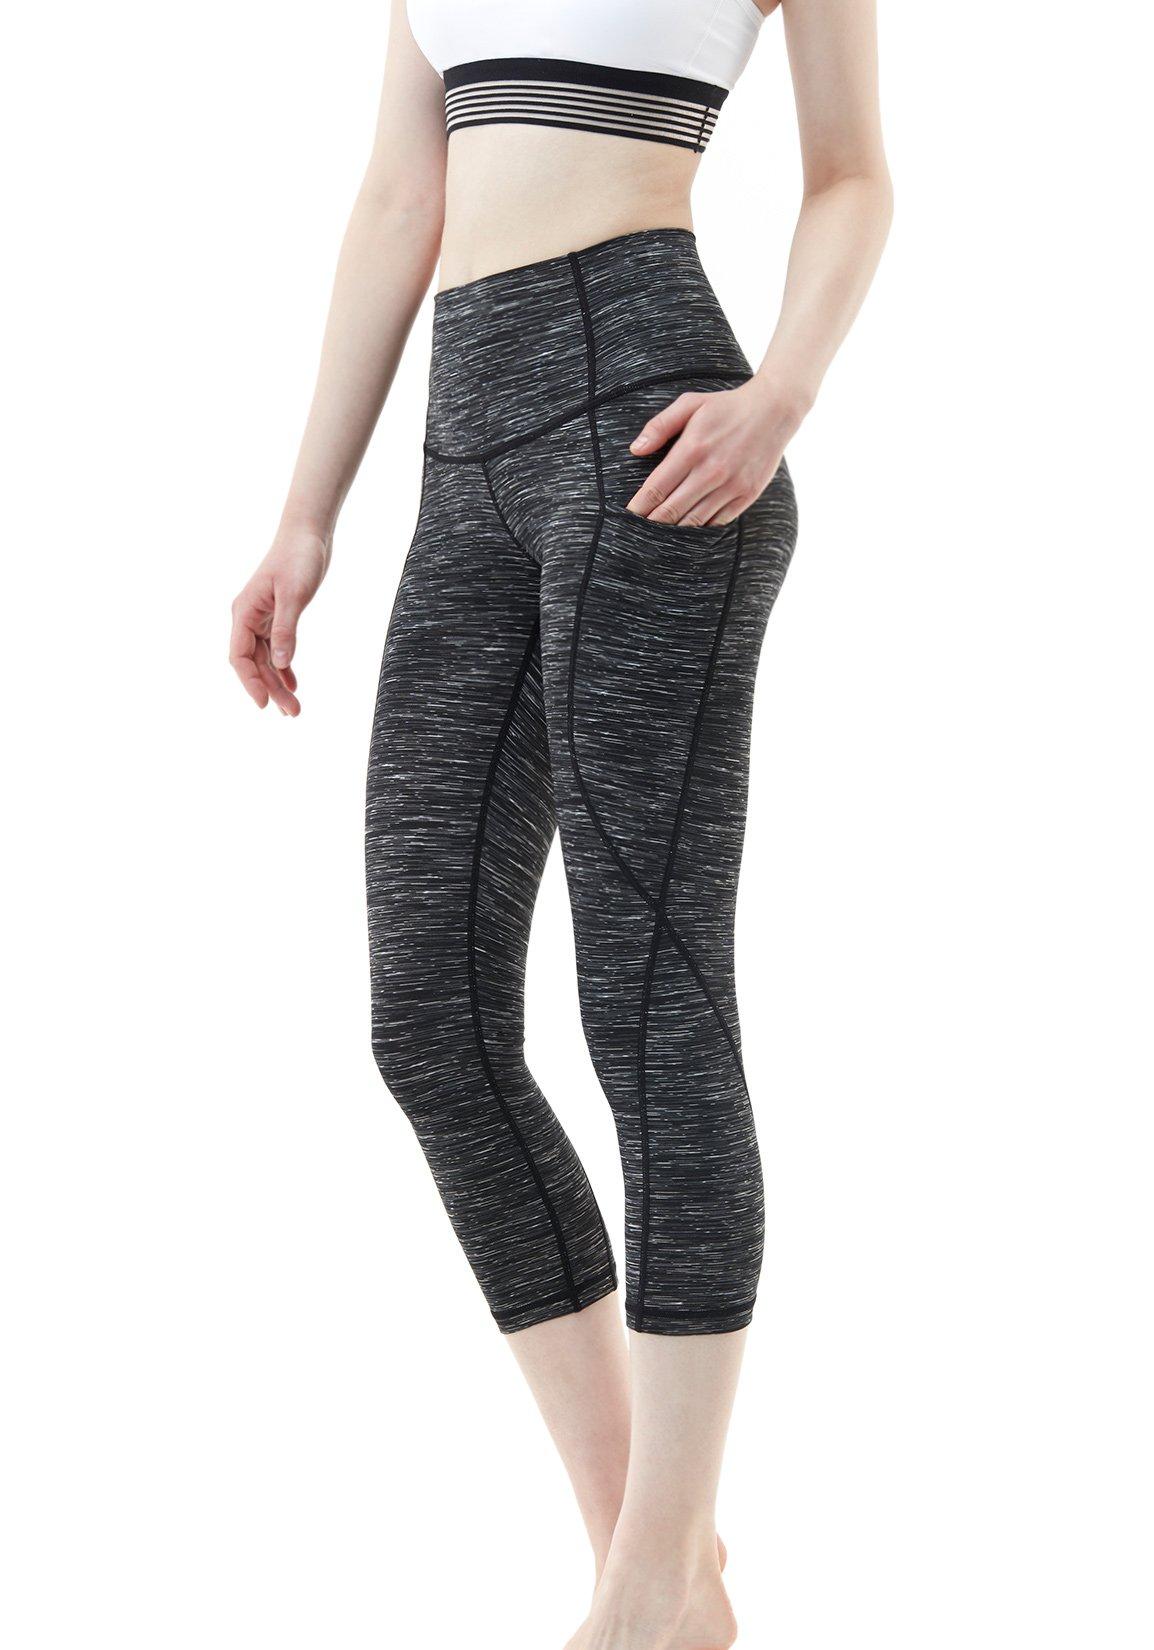 Best Rated In Womens Yoga Pants Helpful Customer Reviews Fashion Big Size Valerie Stripe Navy 3xl Tesla High Waist Tummy Control W Hidden Pocket Fyc32 Fyc34 Fyc36